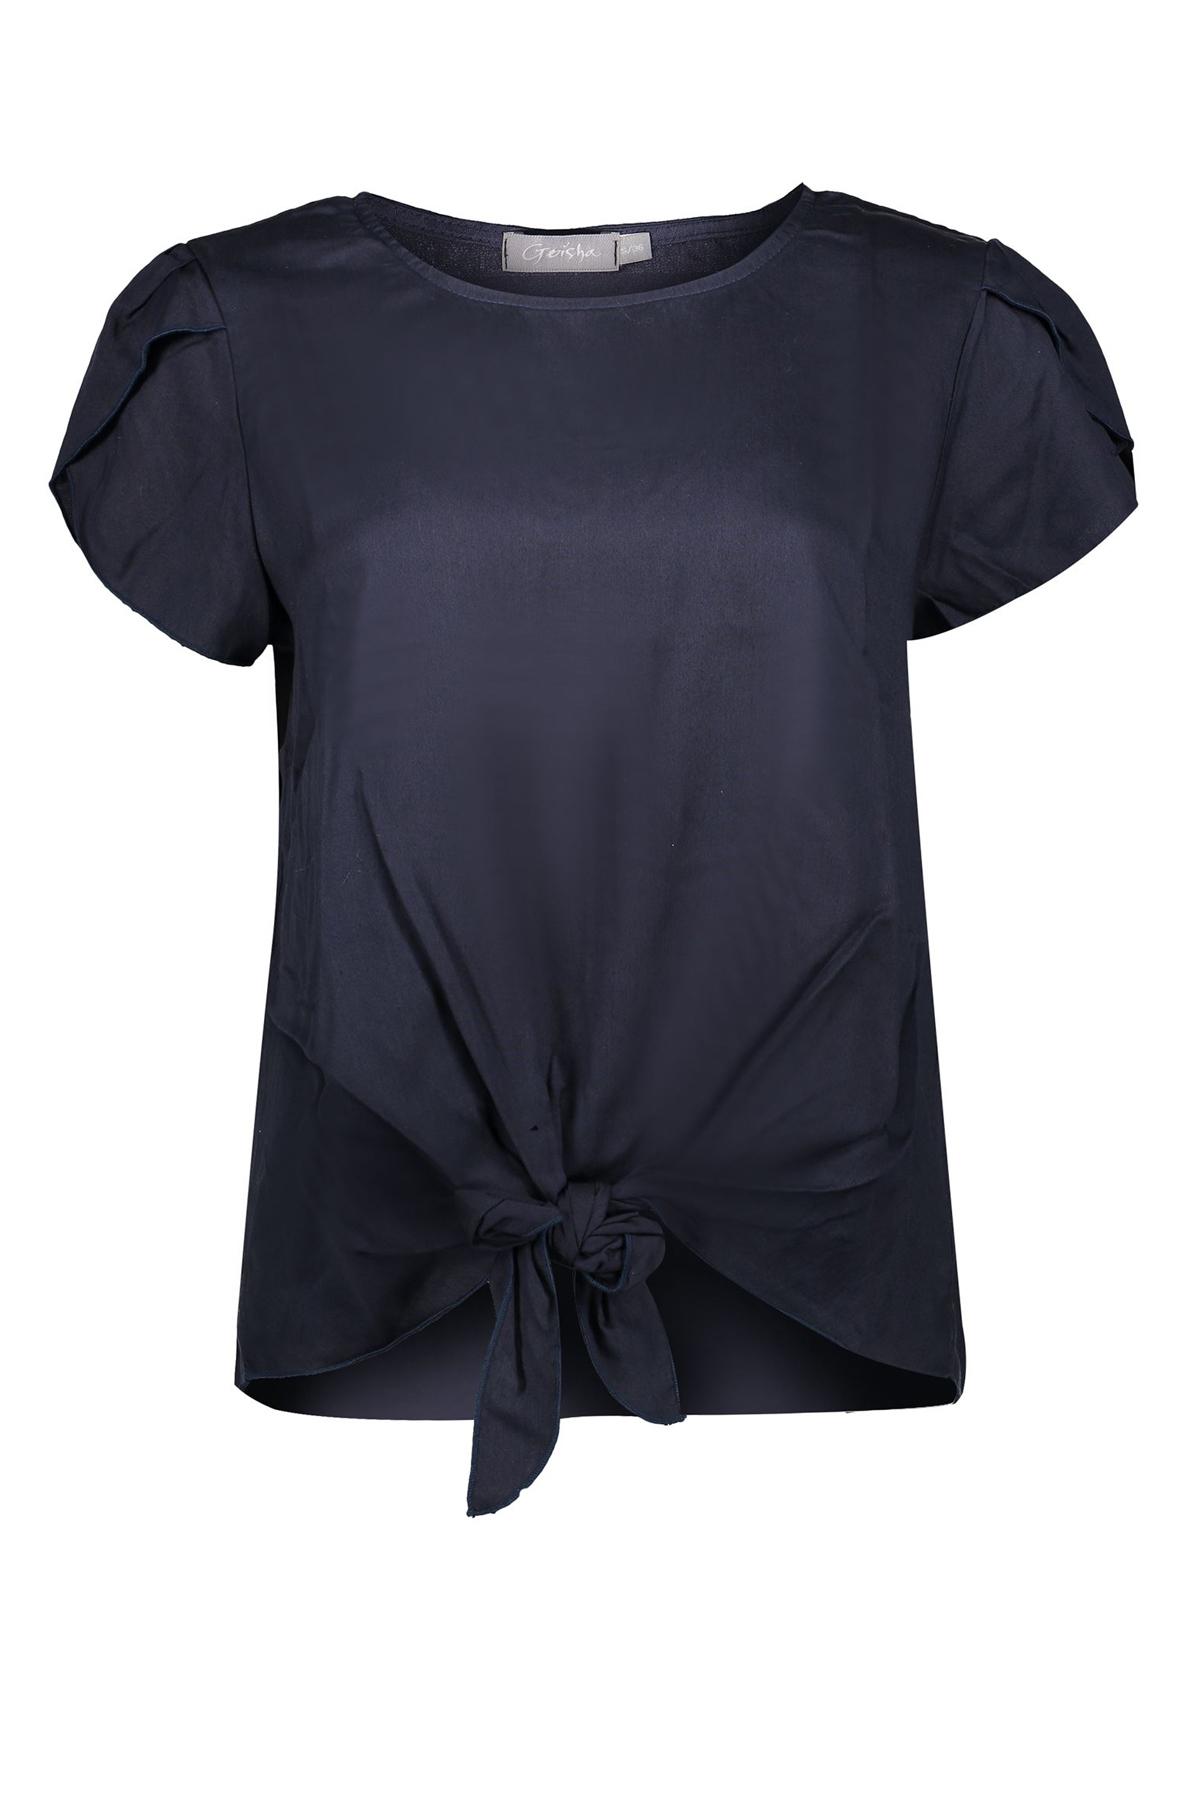 Geisha Shirt - Top Blauw 03289-70